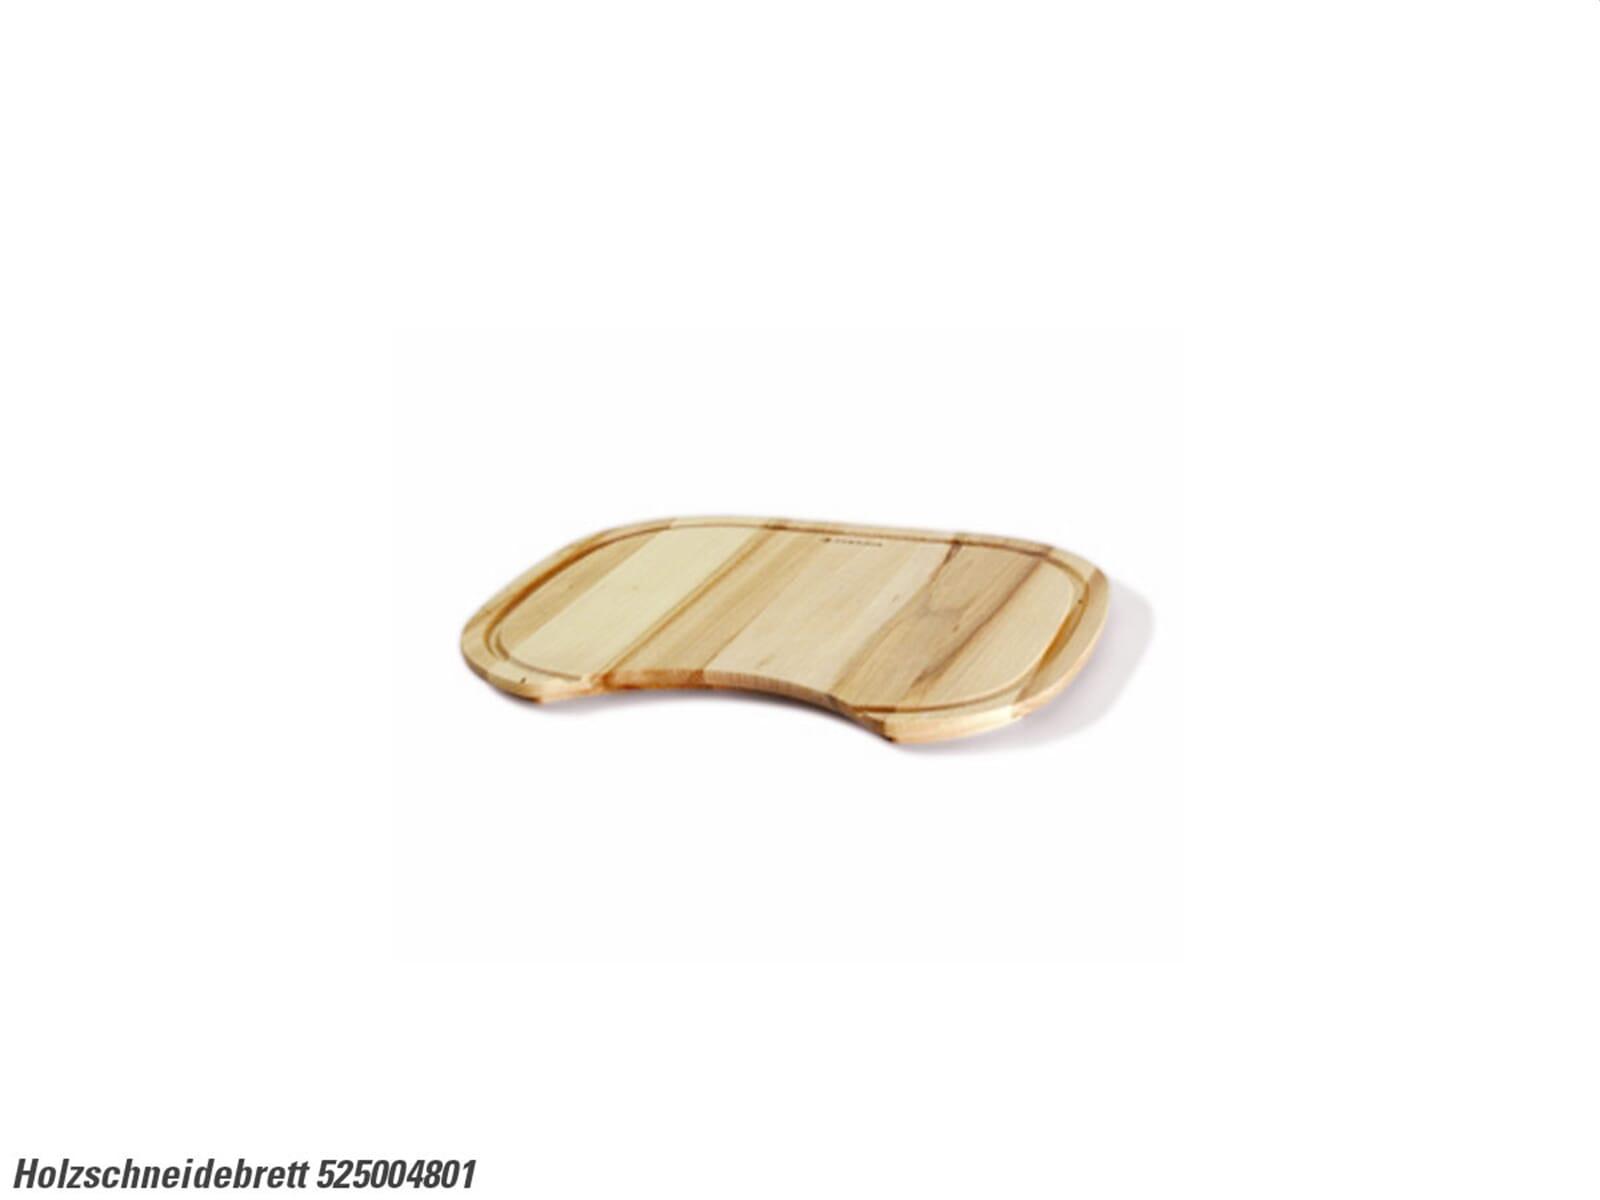 Pyramis 525004801 Holzschneidebrett Buche